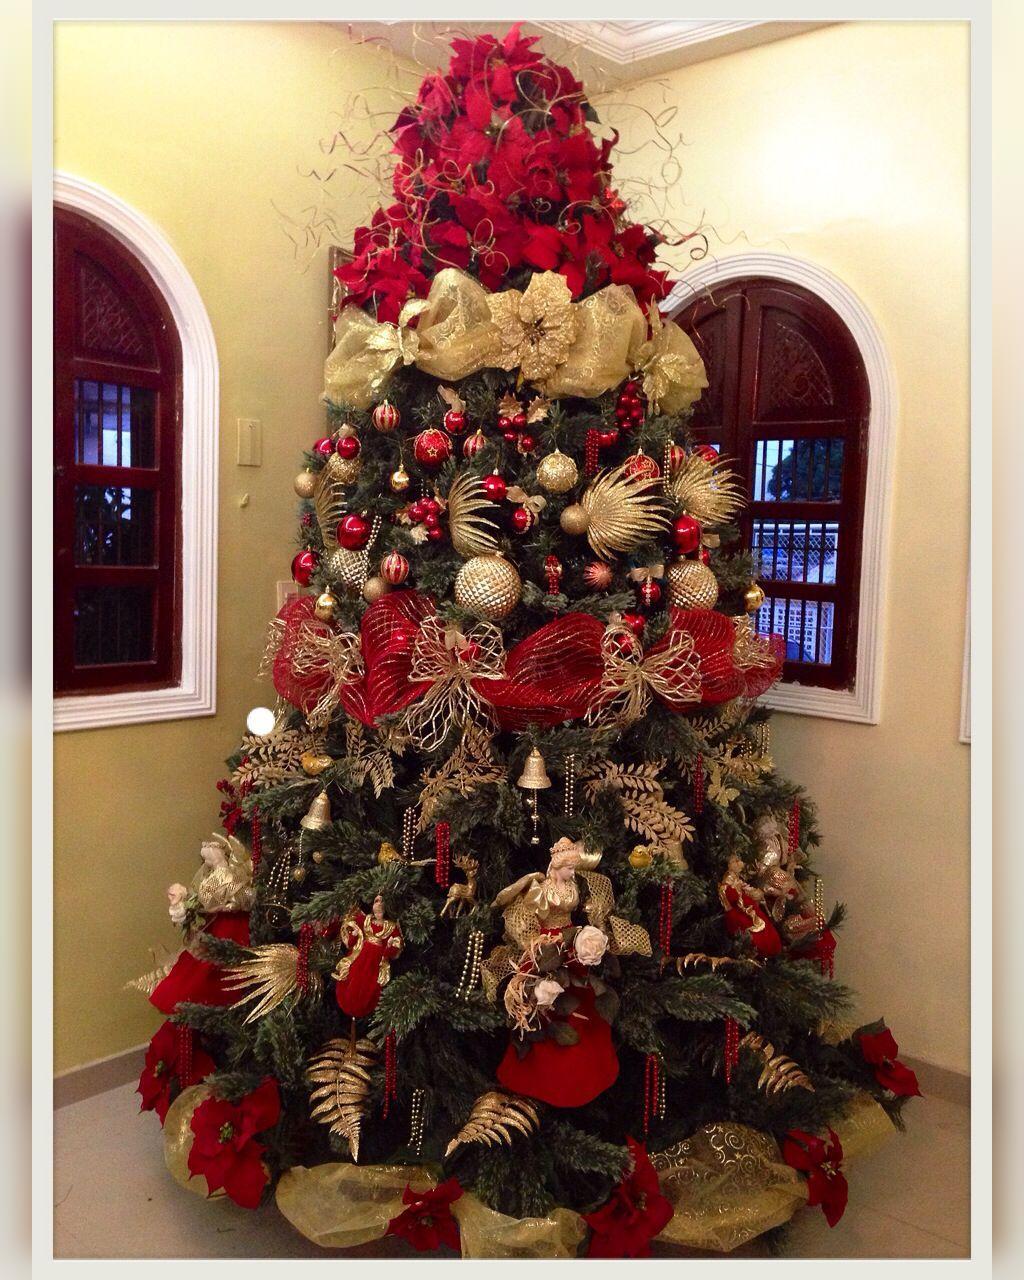 عکس درخت کریسمس لاکچری جدید در خانه